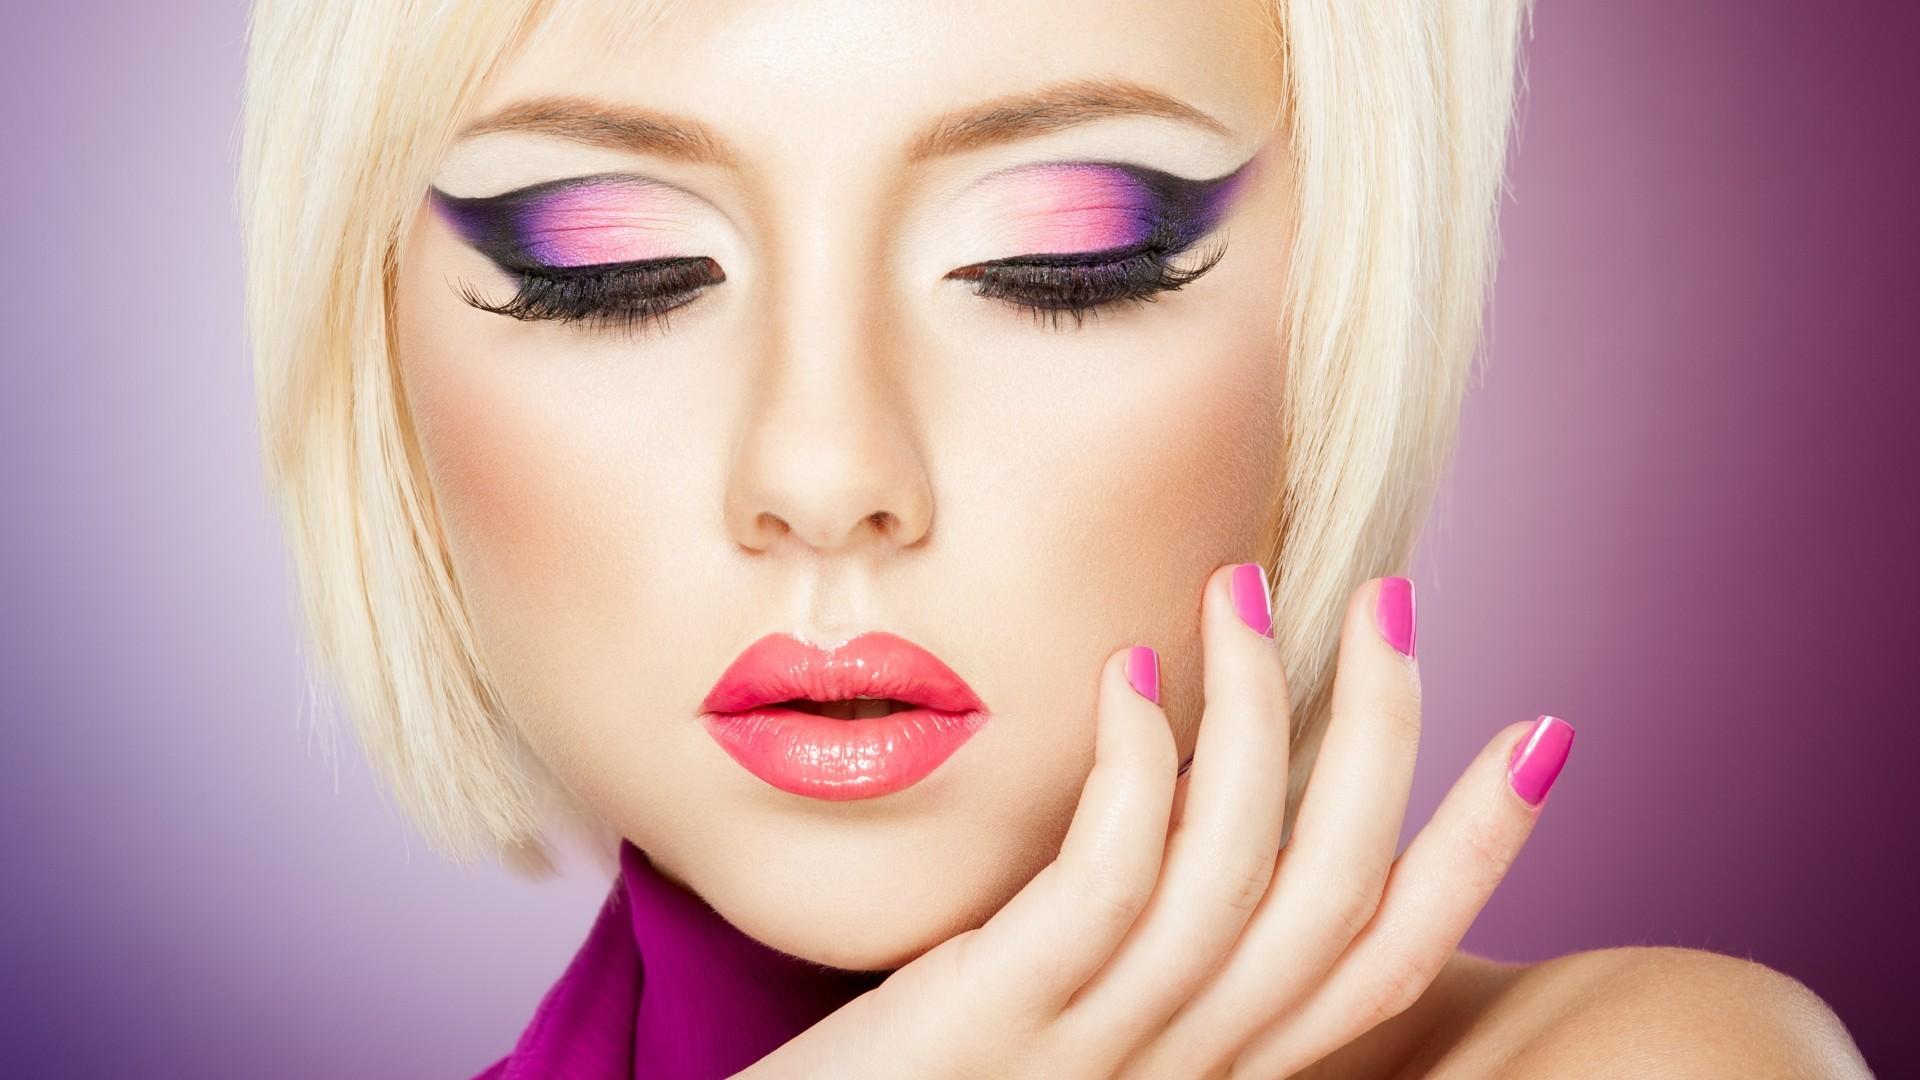 Makeup Wallpapers (67+ images)